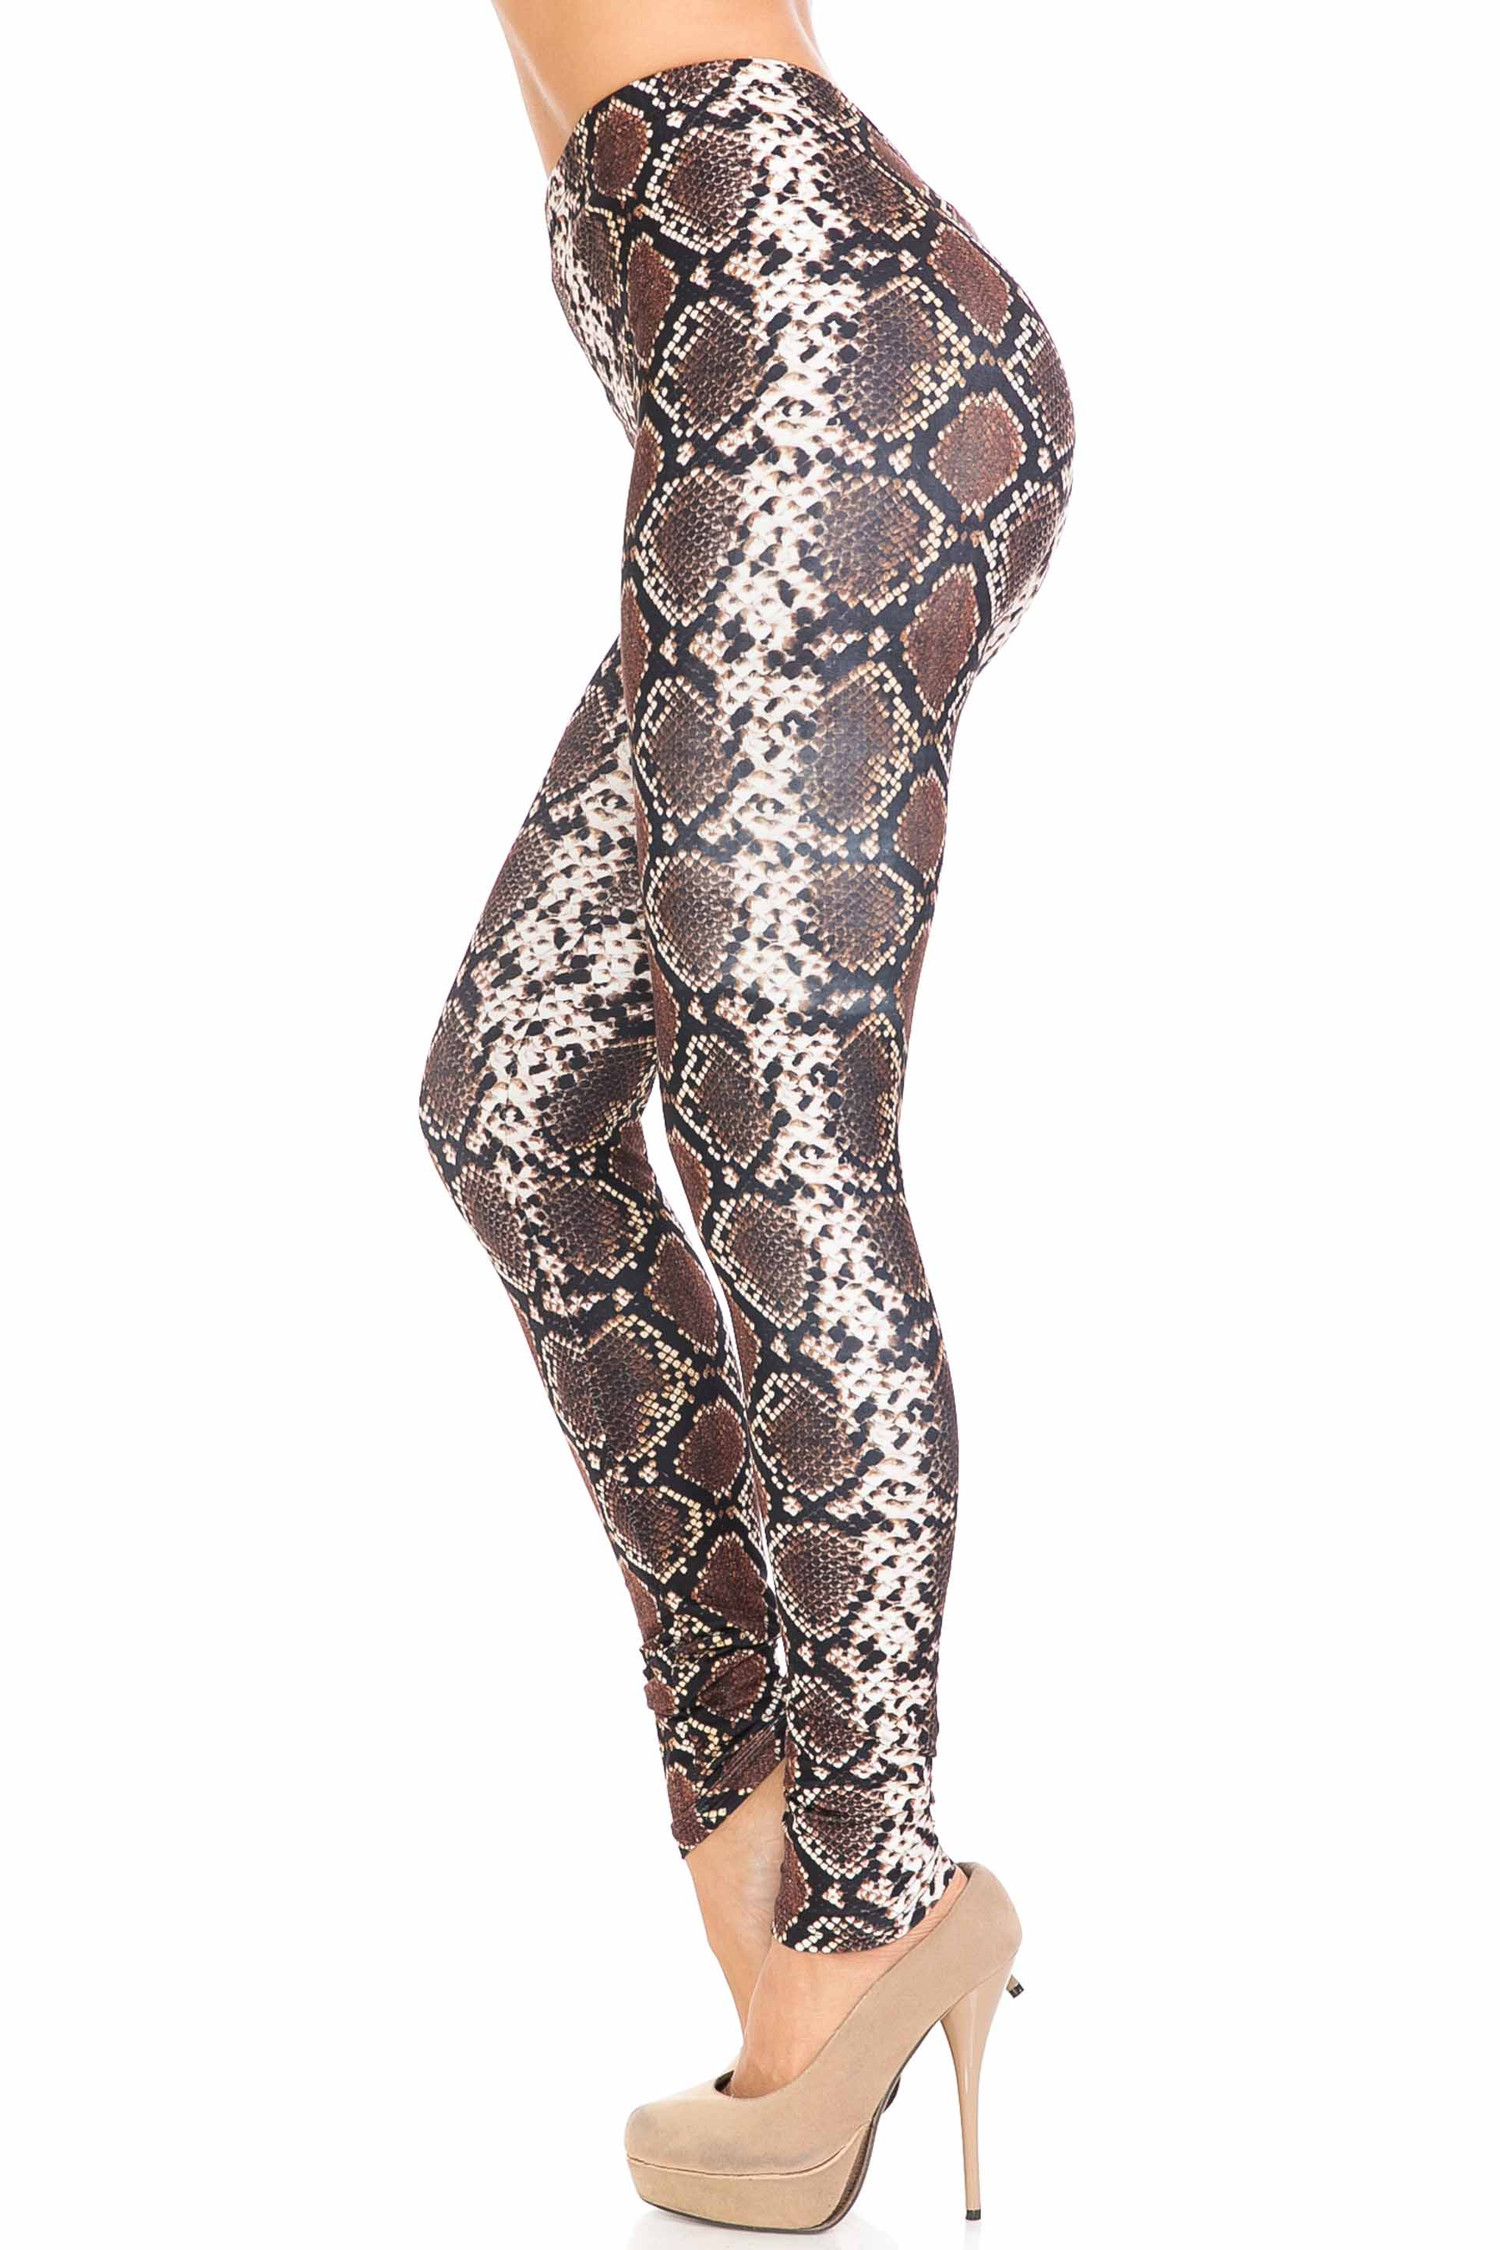 Left side of Creamy Soft Brown Boa Plus Size Leggings - USA Fashion™